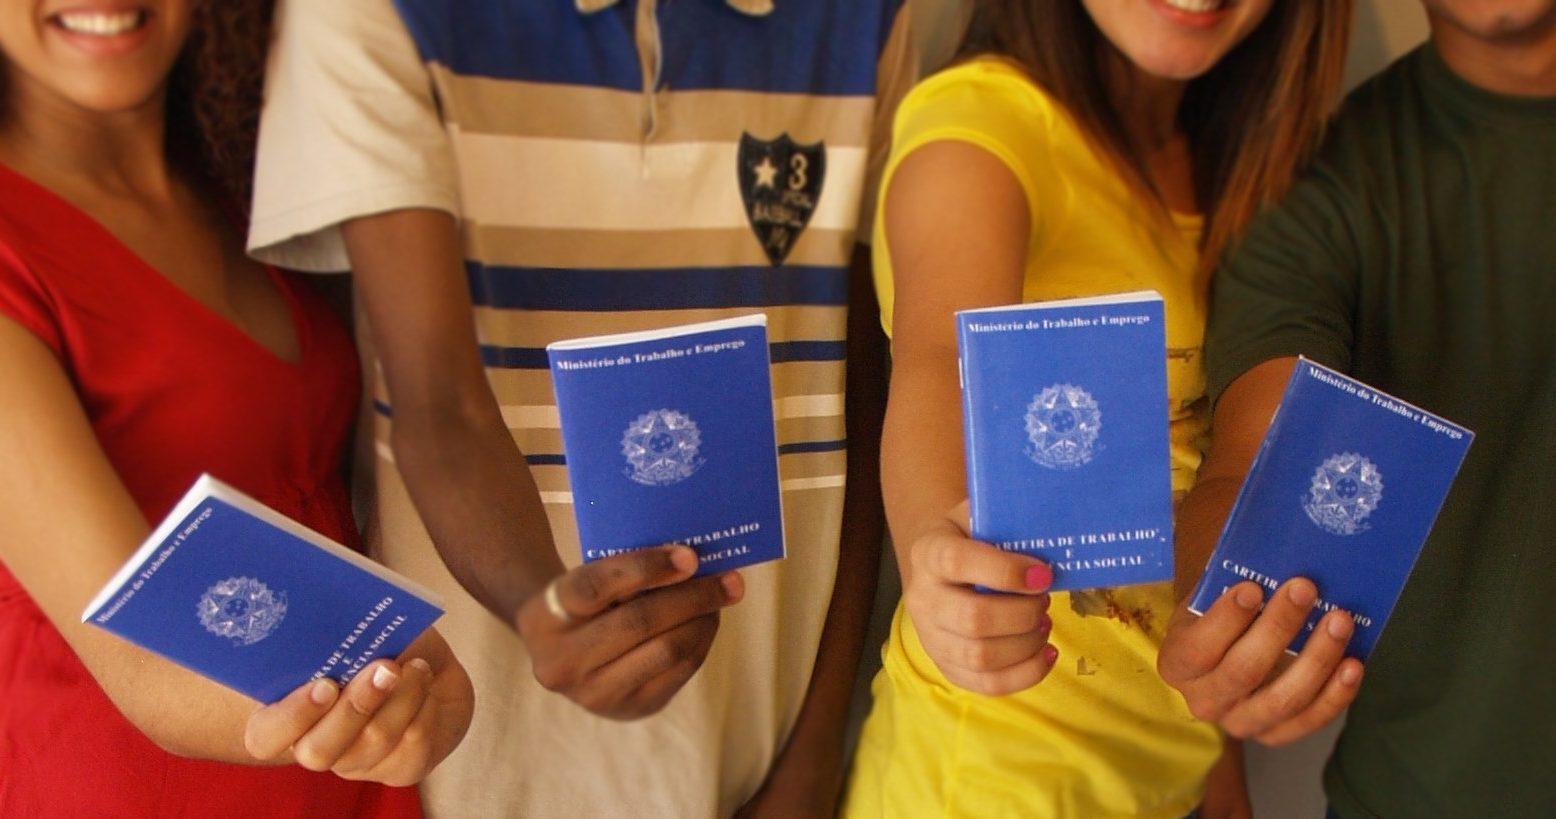 Vaga – Prefeitura de Salvador oferece 60 vagas de estágios para ensino médio – Salvador Empregos